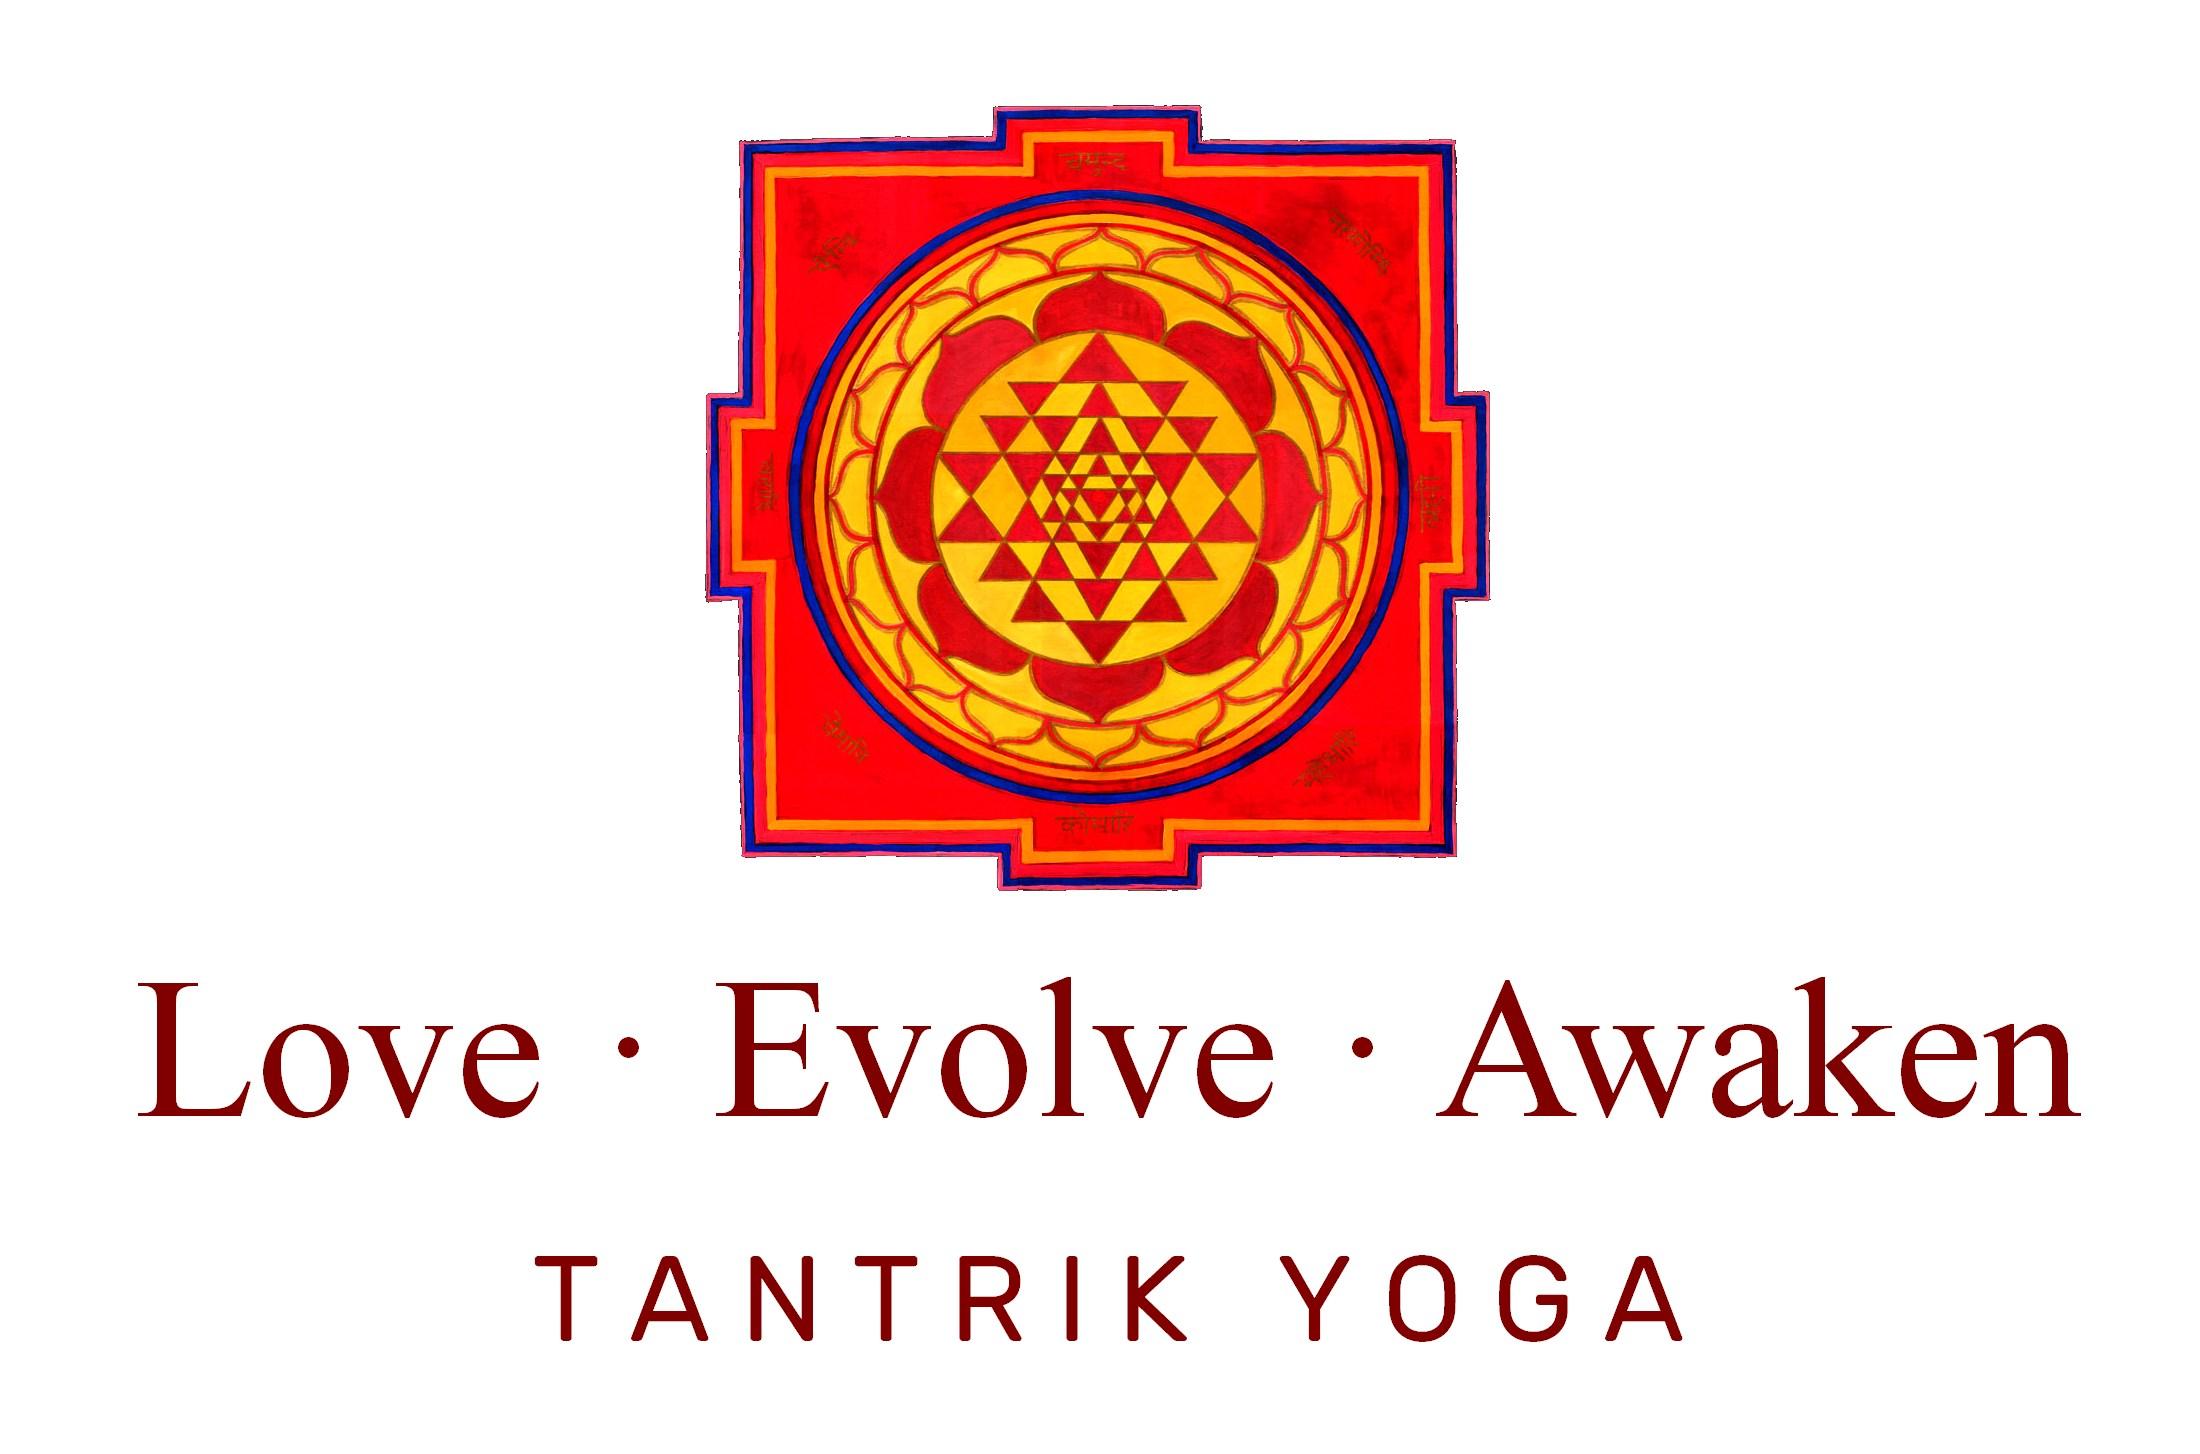 Love Evolve Awaken logo